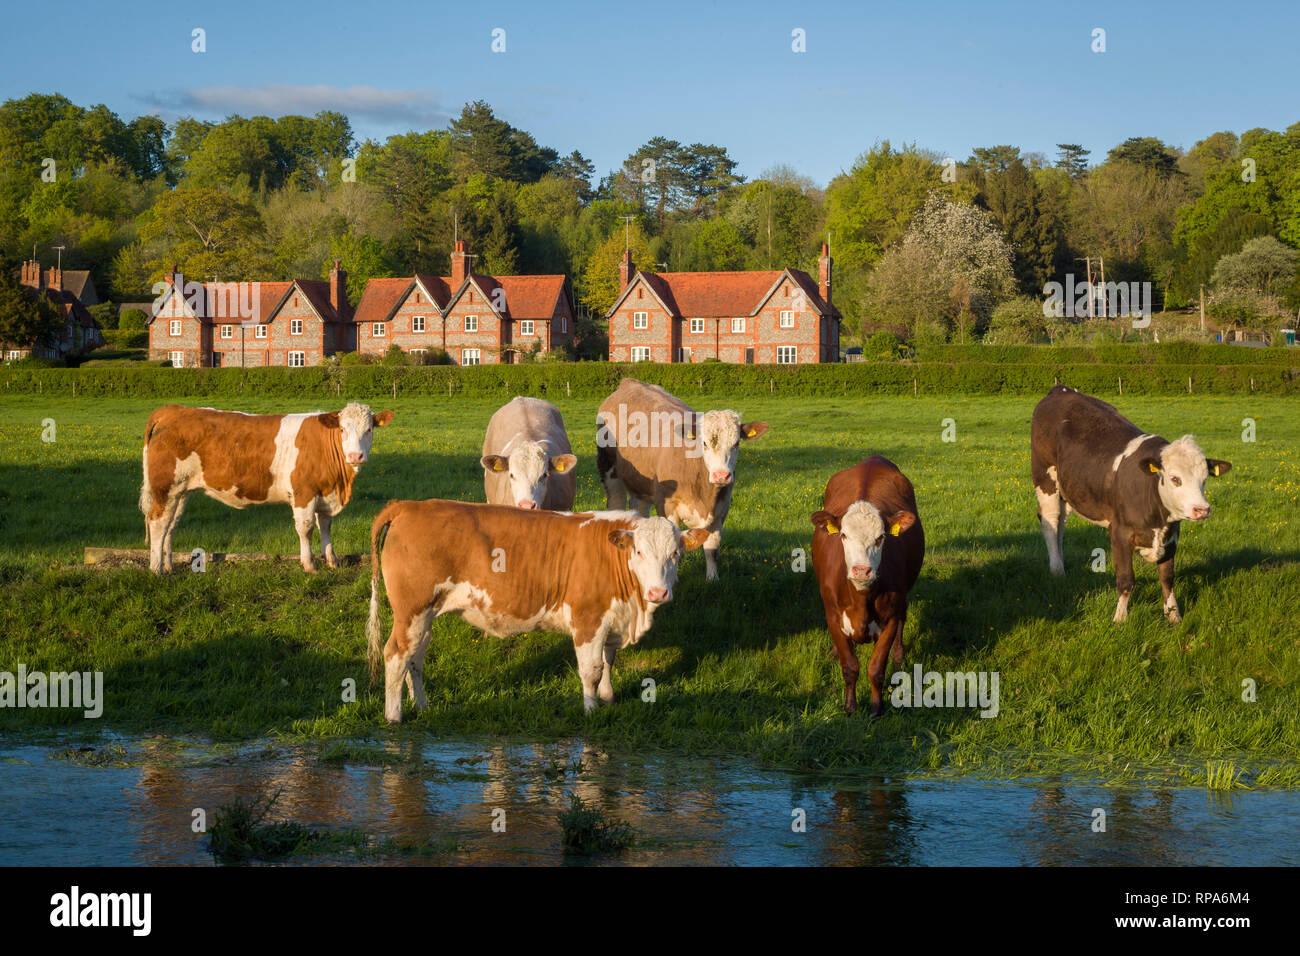 Cattle graze by the brook, near Hambleden, Buckinghamshire Stock Photo